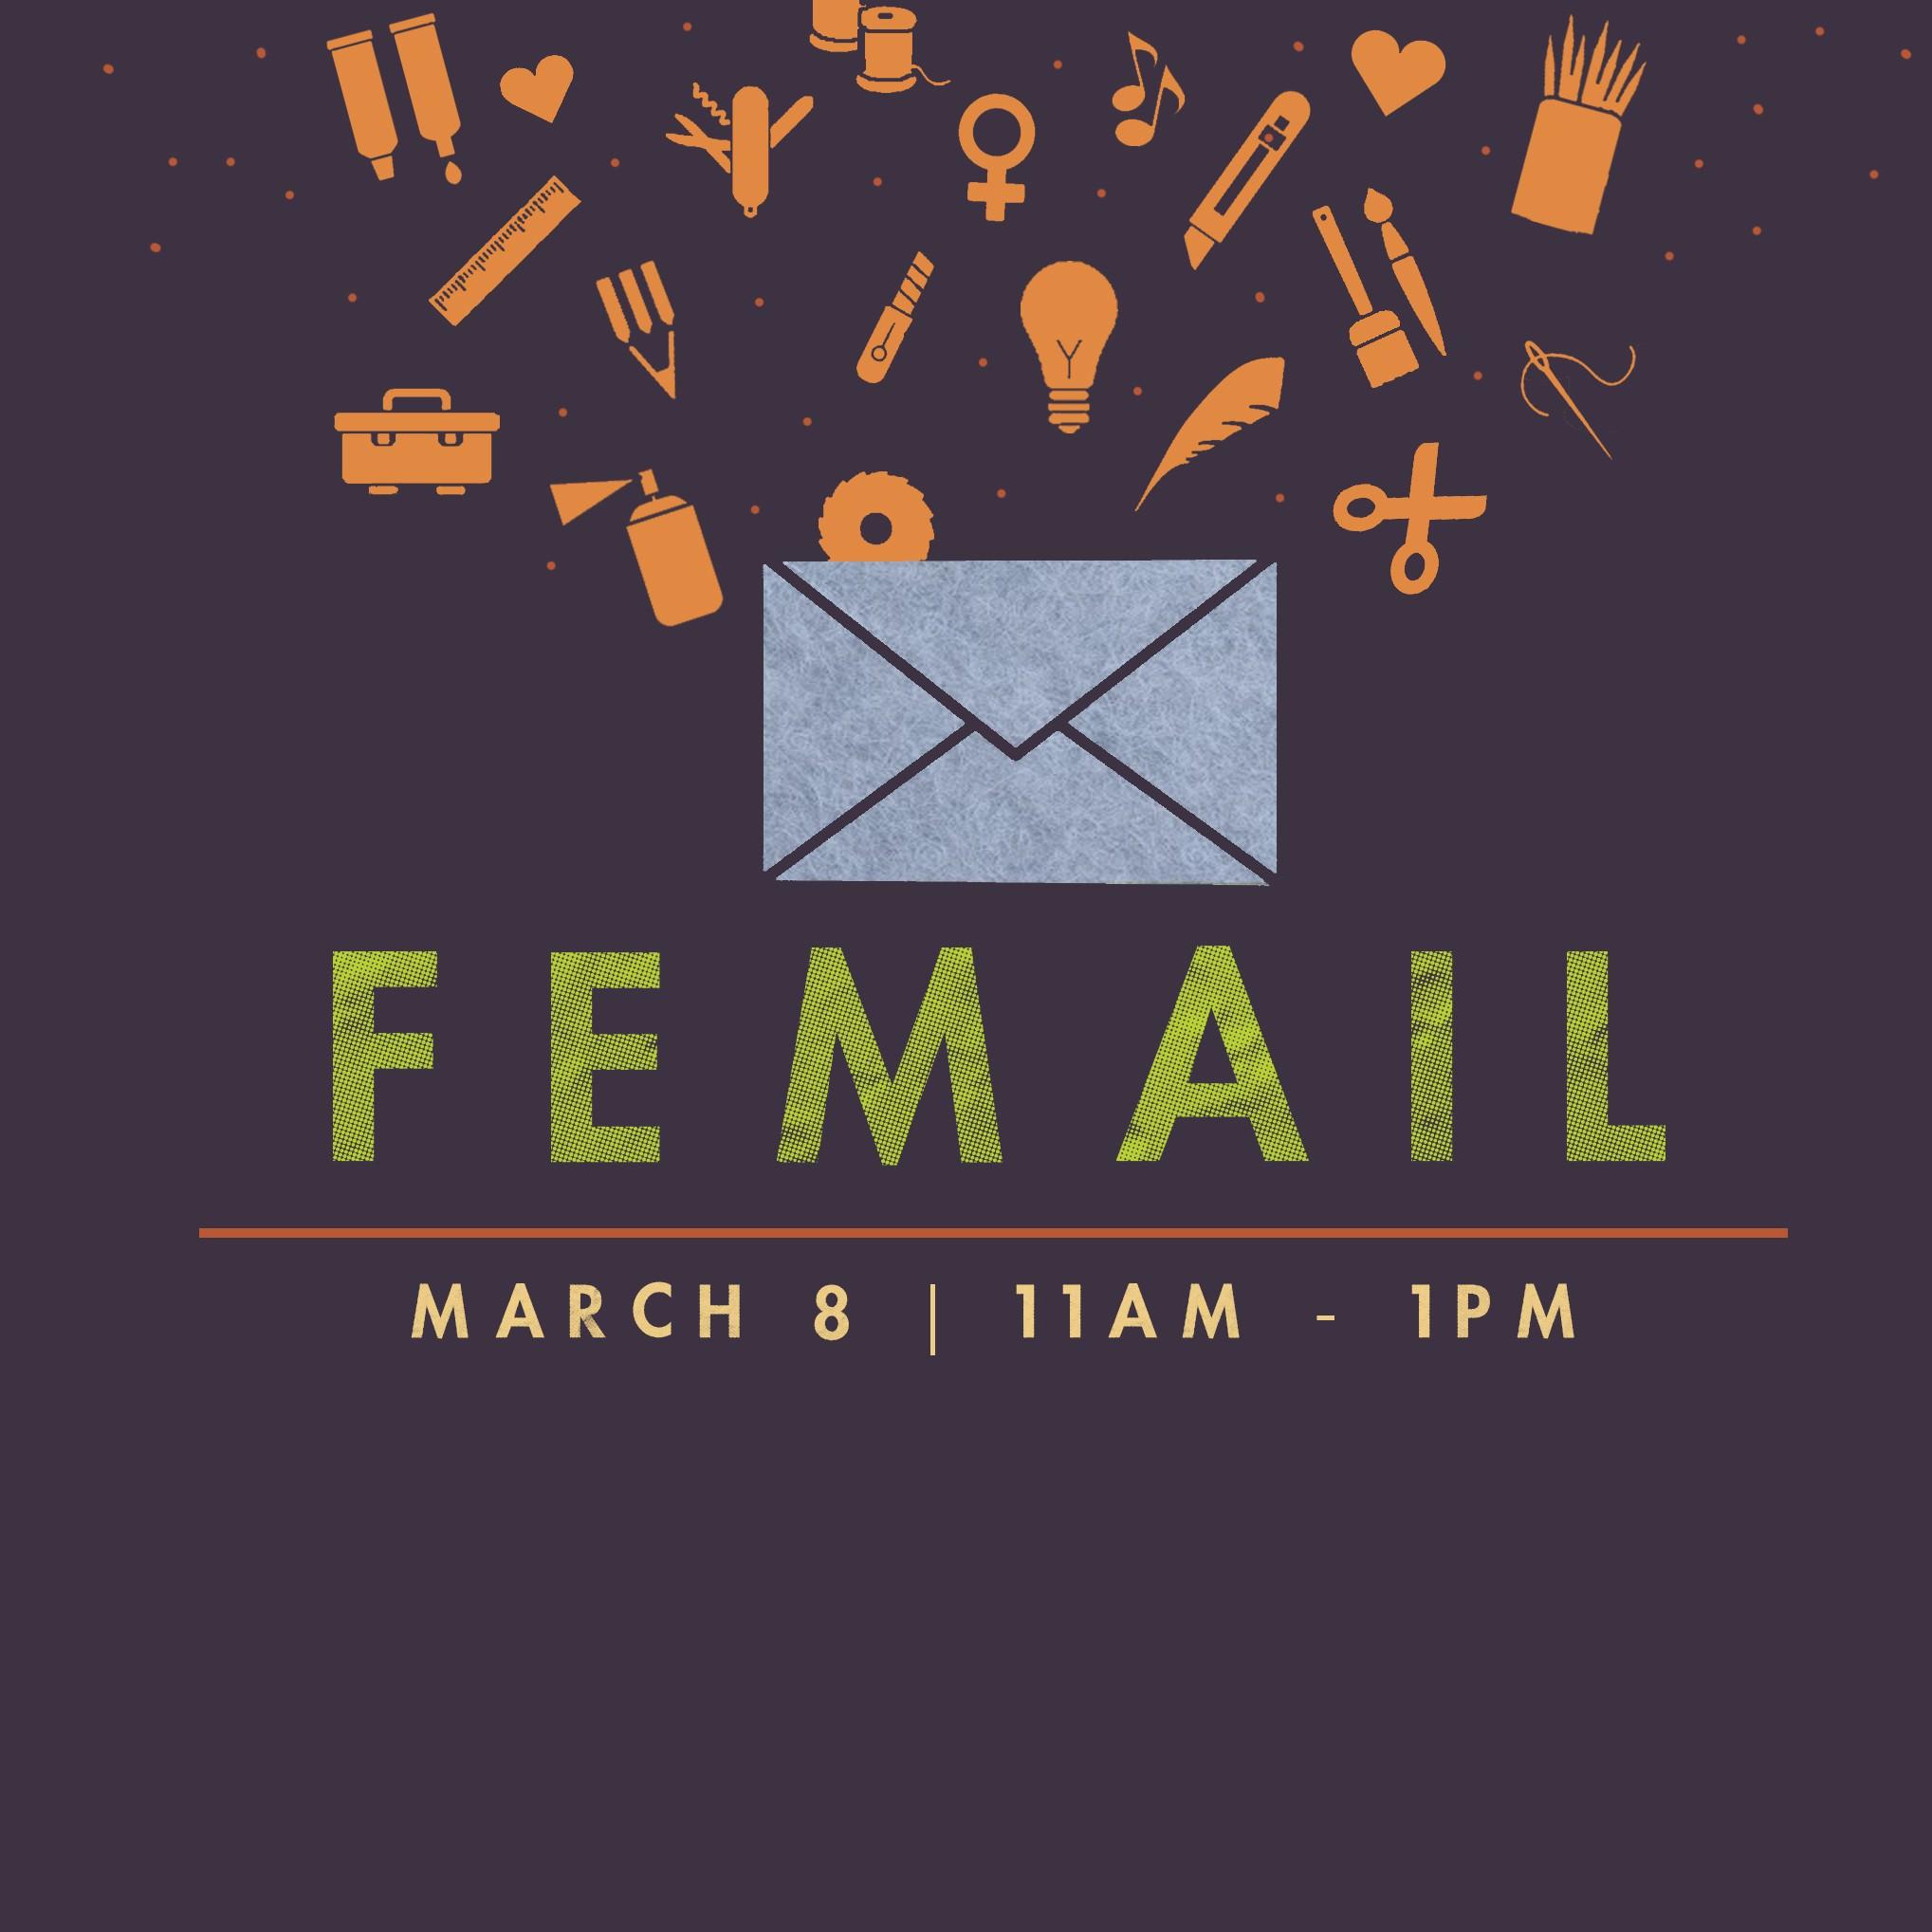 FeMail website